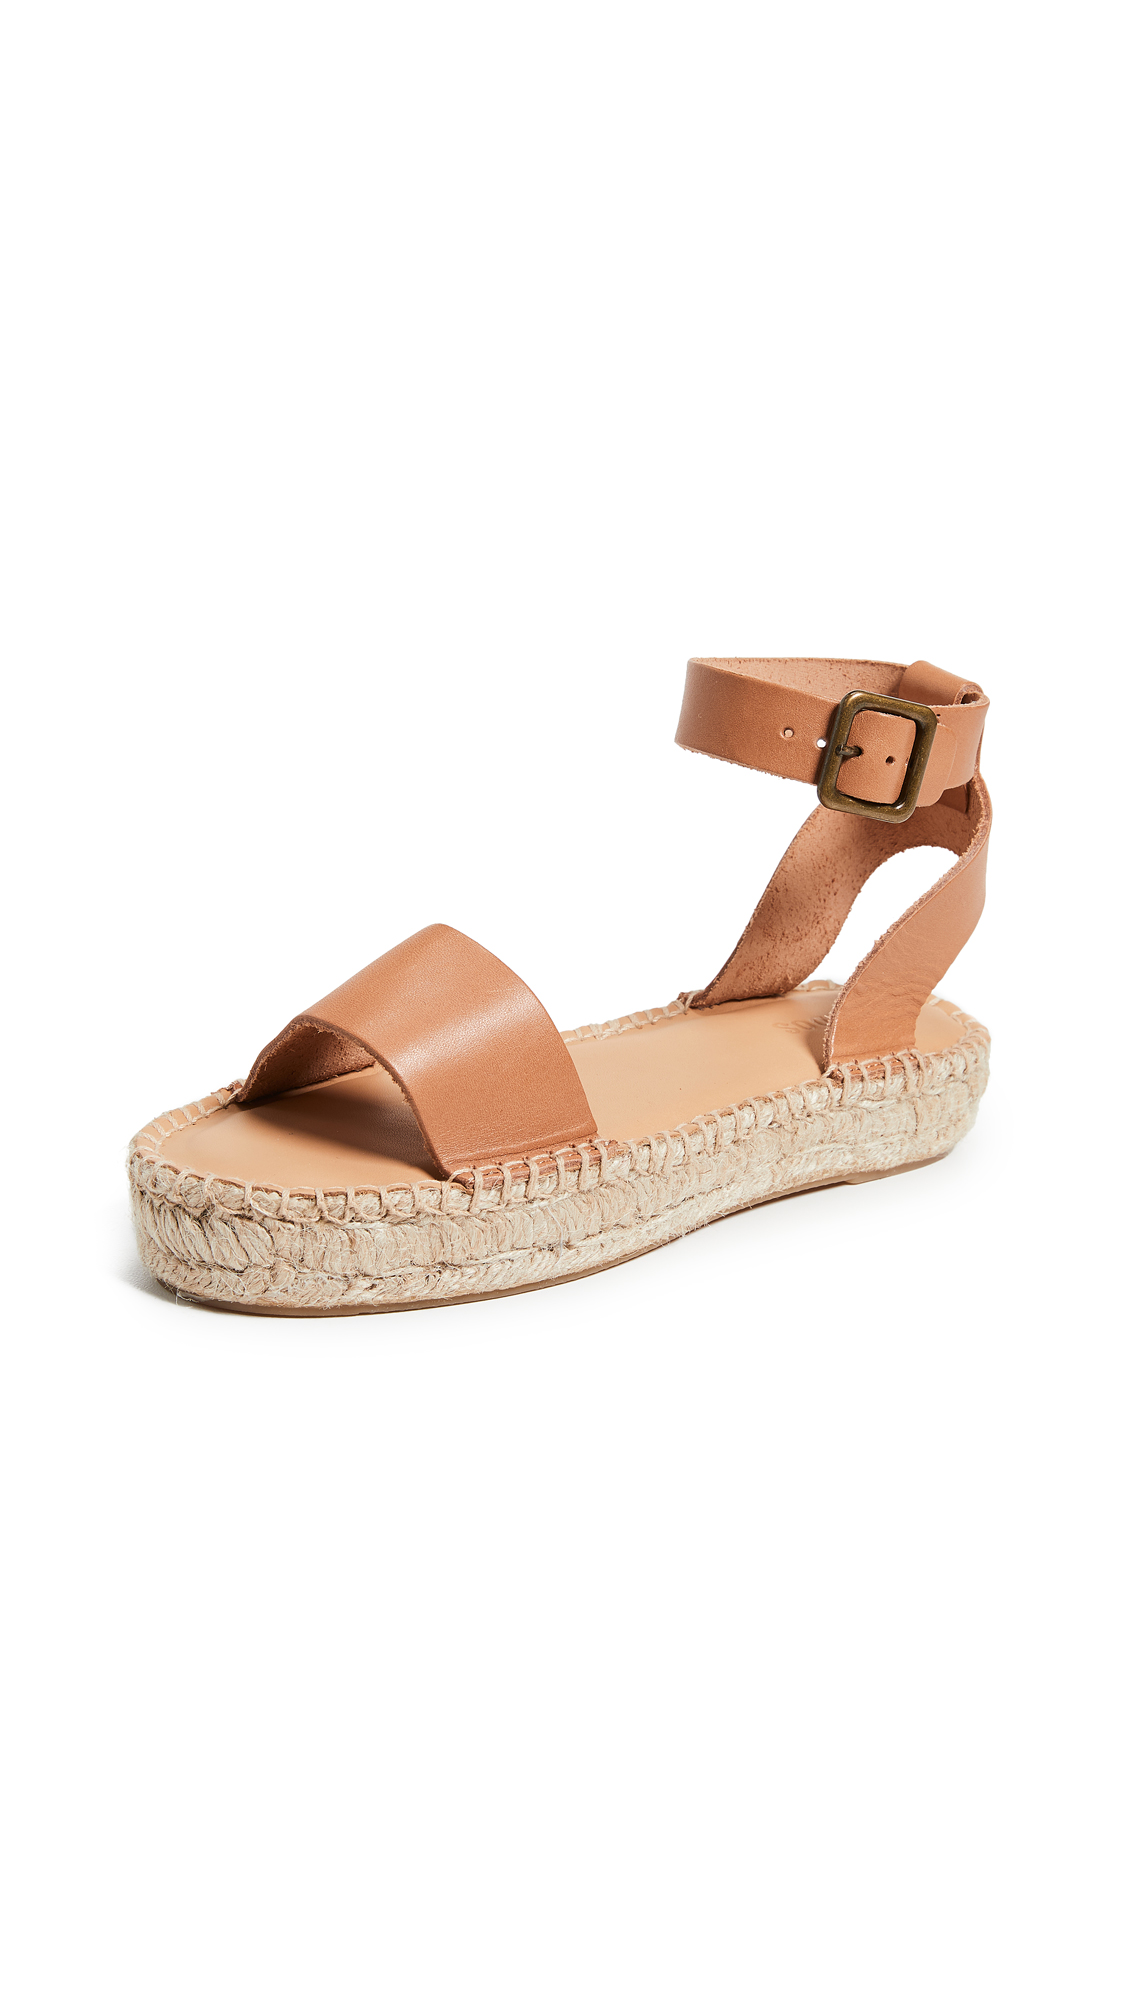 Soludos Cadiz Sandals - Nude